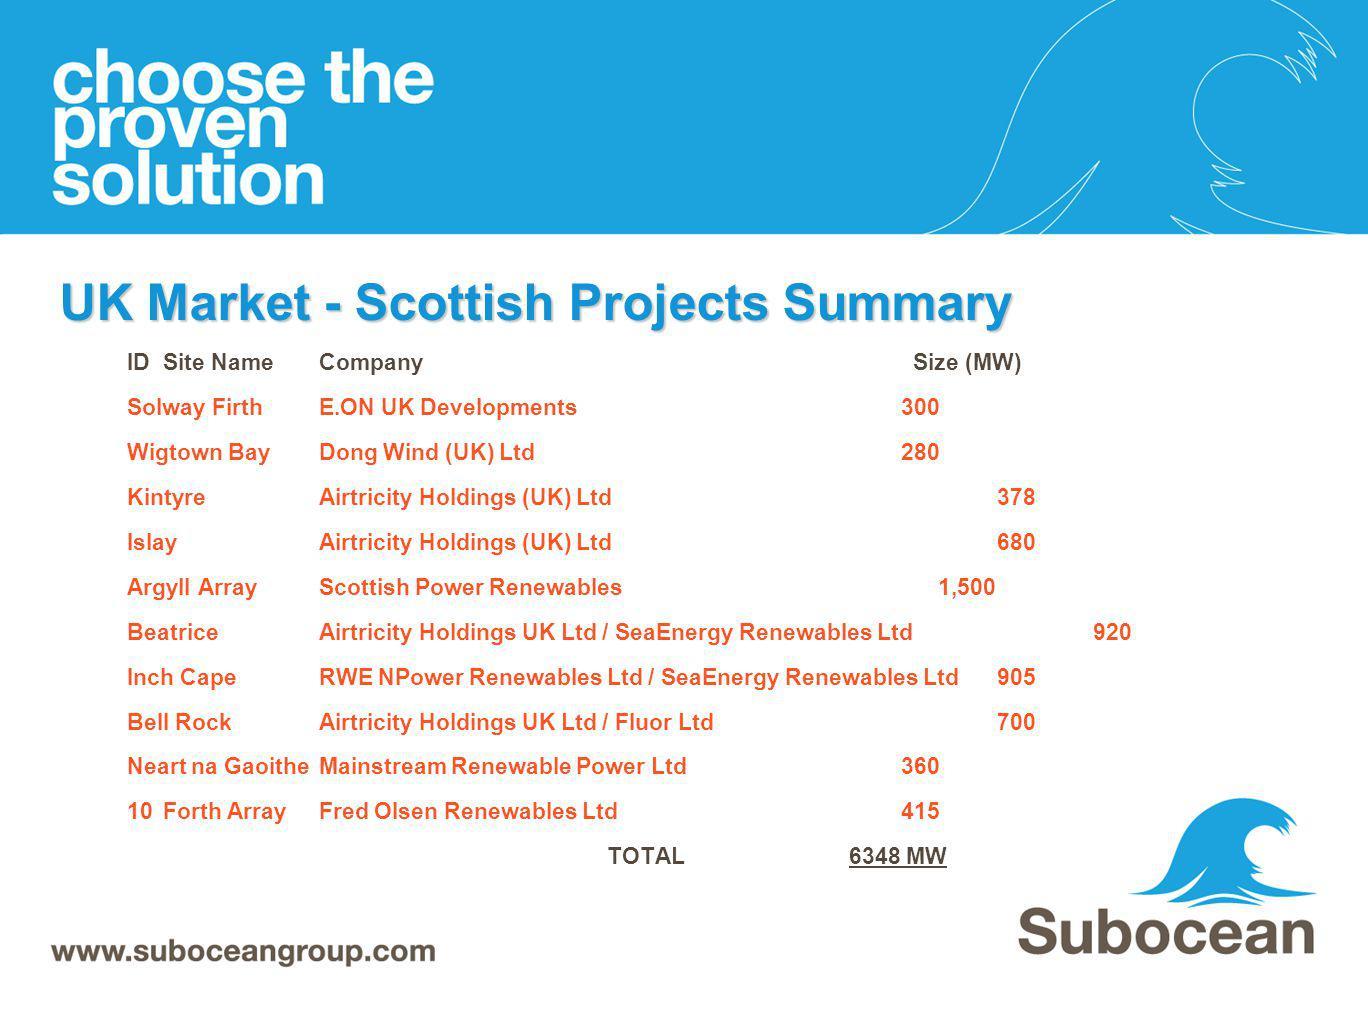 UK Market - Scottish Projects Summary ID Site NameCompany Size (MW) Solway FirthE.ON UK Developments 300 Wigtown BayDong Wind (UK) Ltd 280 KintyreAirt